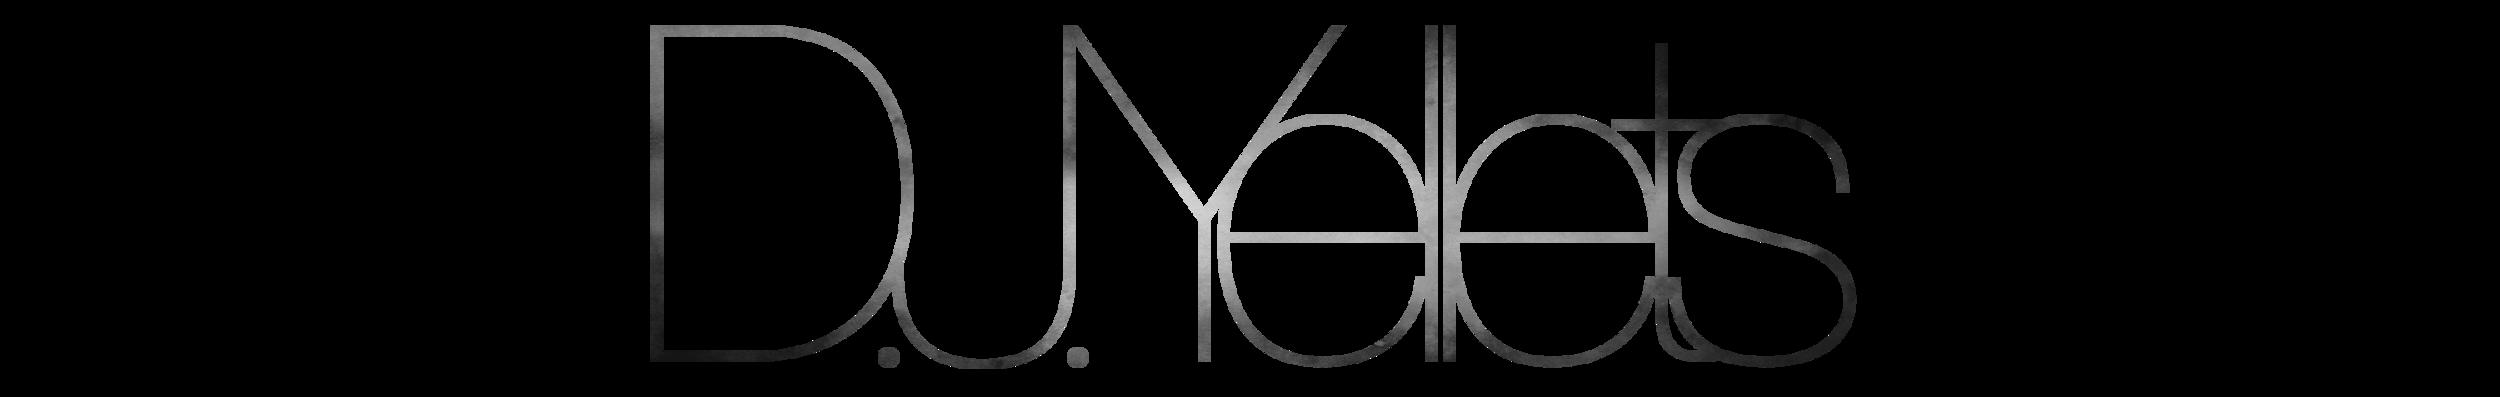 D.J. Yellets Logo BW.png